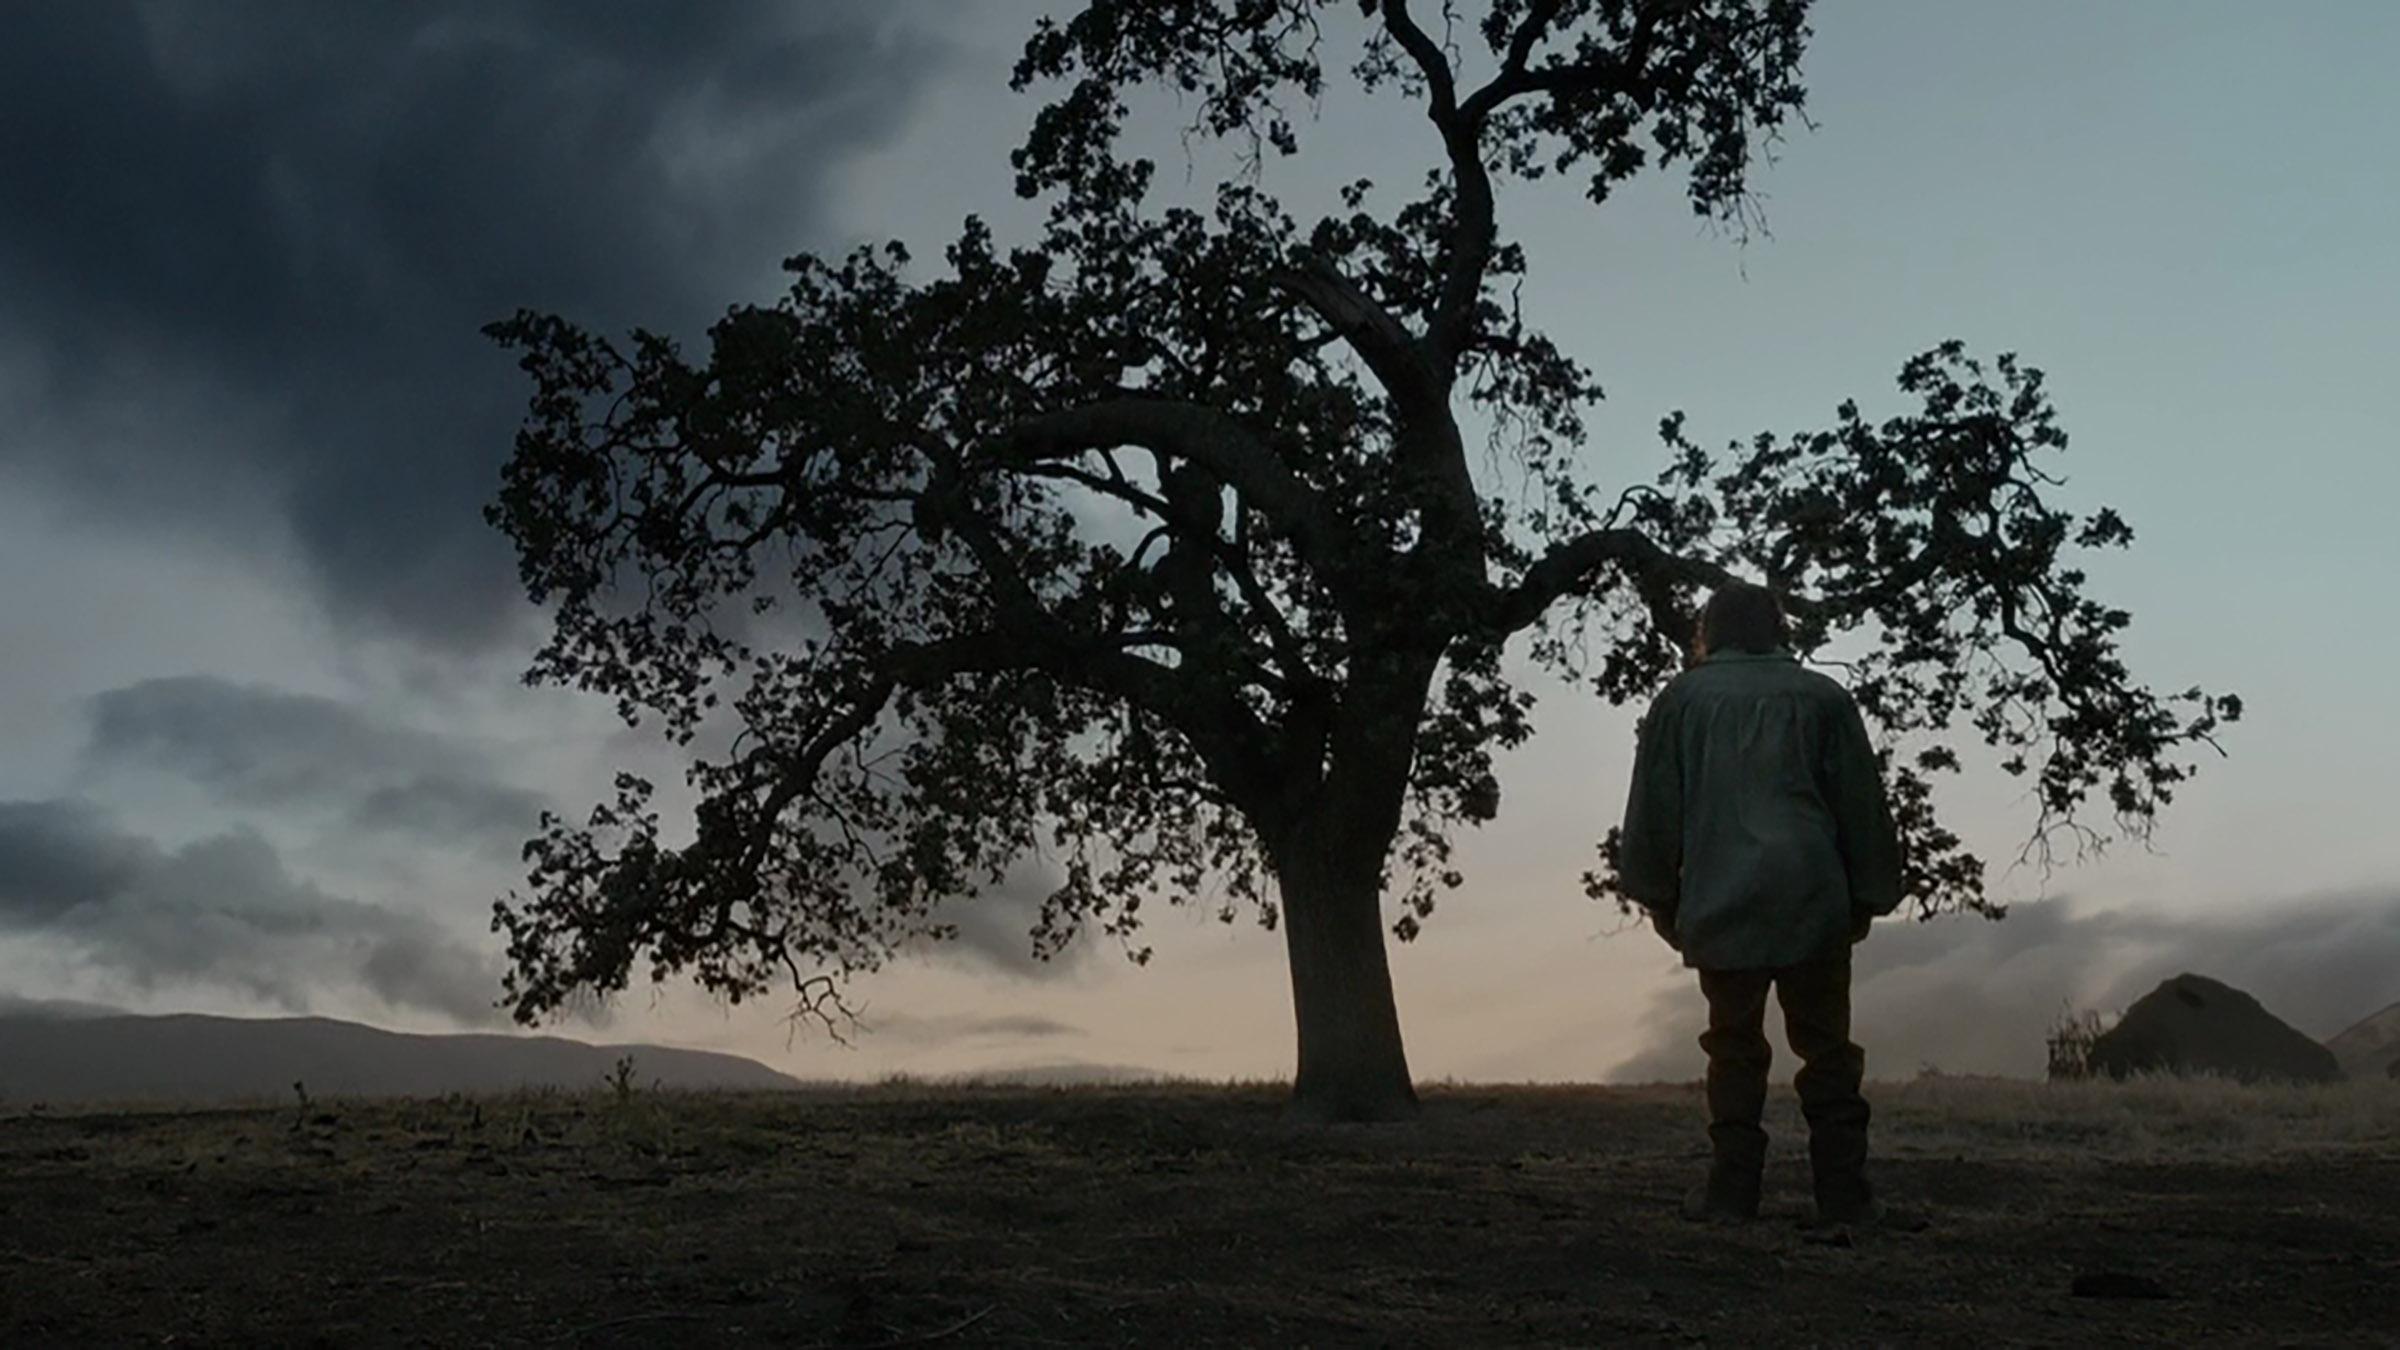 Still taken from The Revenant. Directed by Alejandro González Iñárritu. Cinematography by Emmanuel Lubezki.